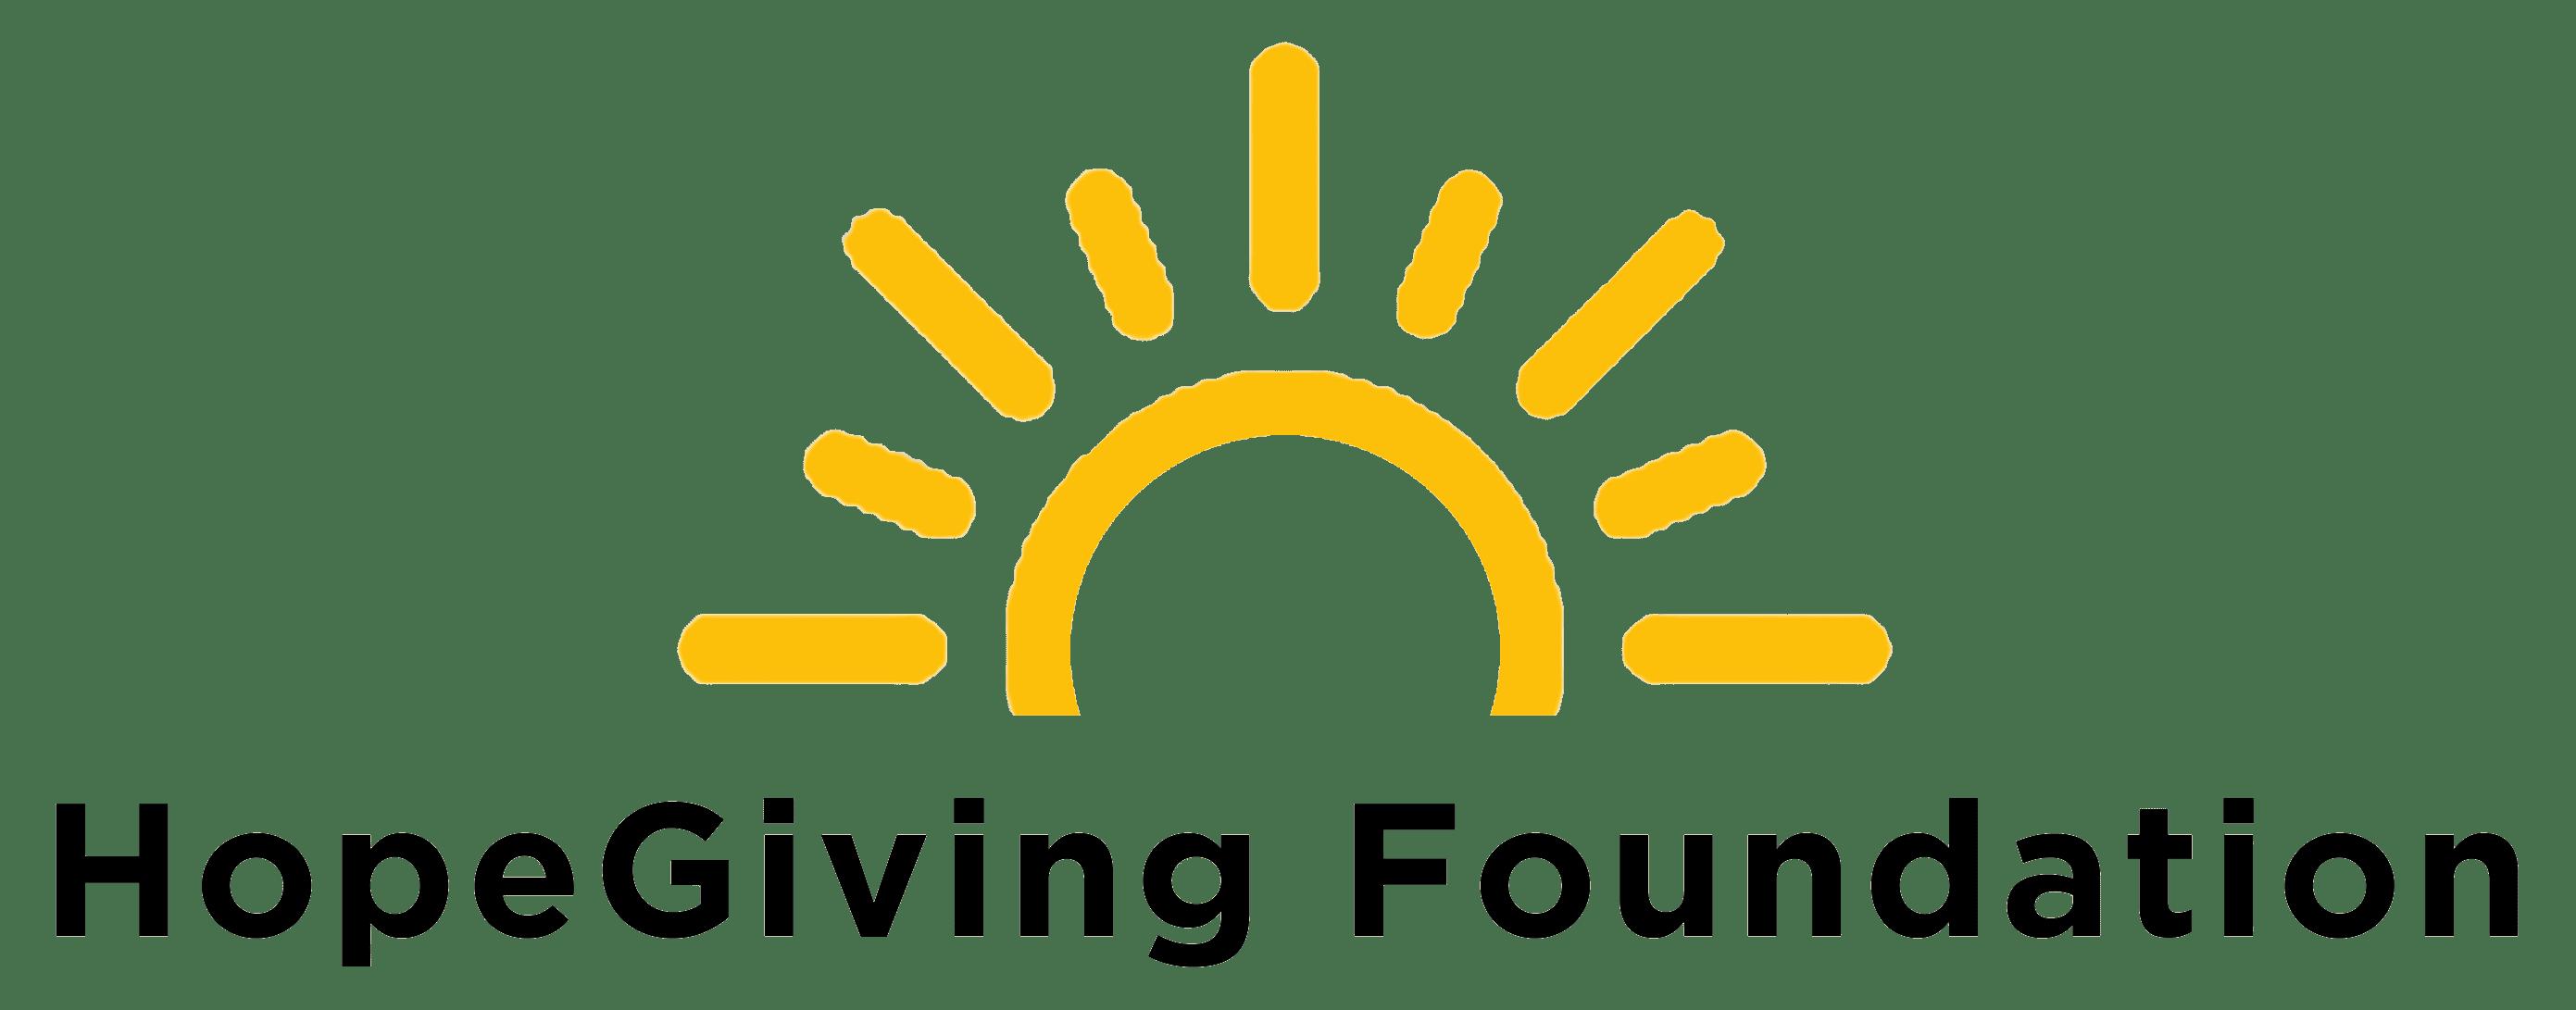 HopeGiving Foundation